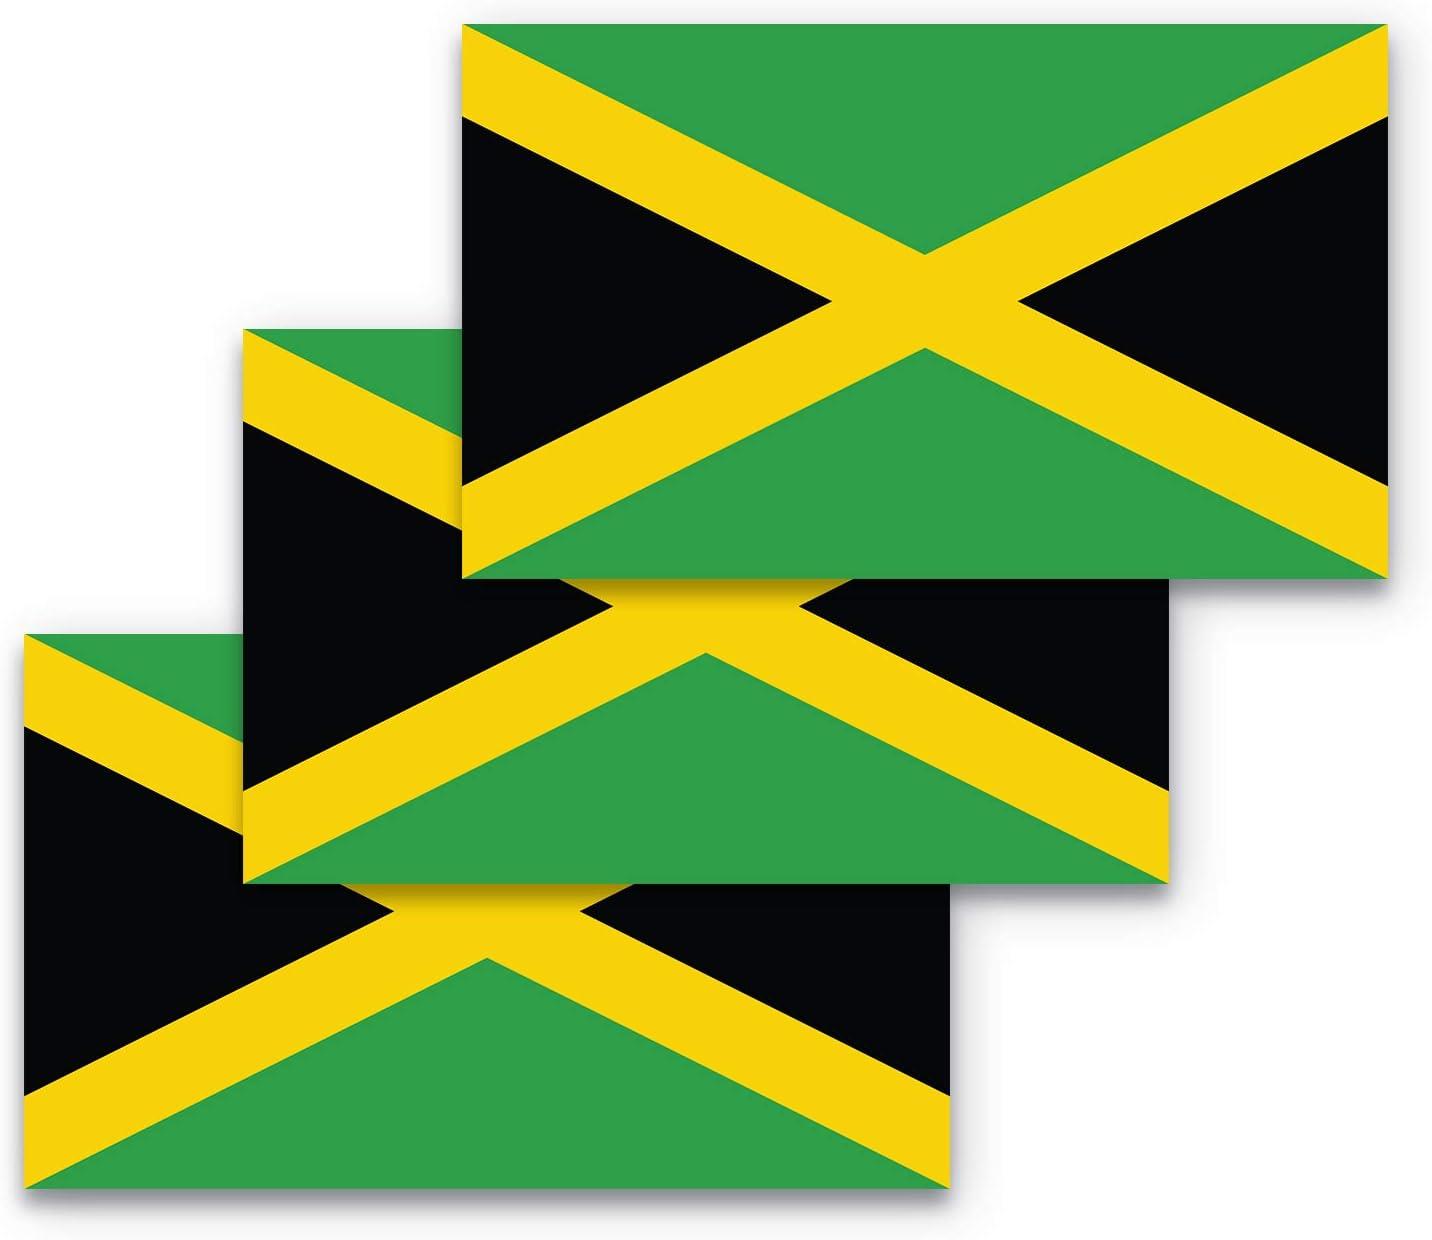 3x5 Jamaica Flag Bumper Sticker 3-Pack Made with Durable, Waterproof Materials, Jamaican Flag Bumper Sticker, Jamaica Bumper Sticker, Jamaica Sticker, Jamaica Flag Sticker